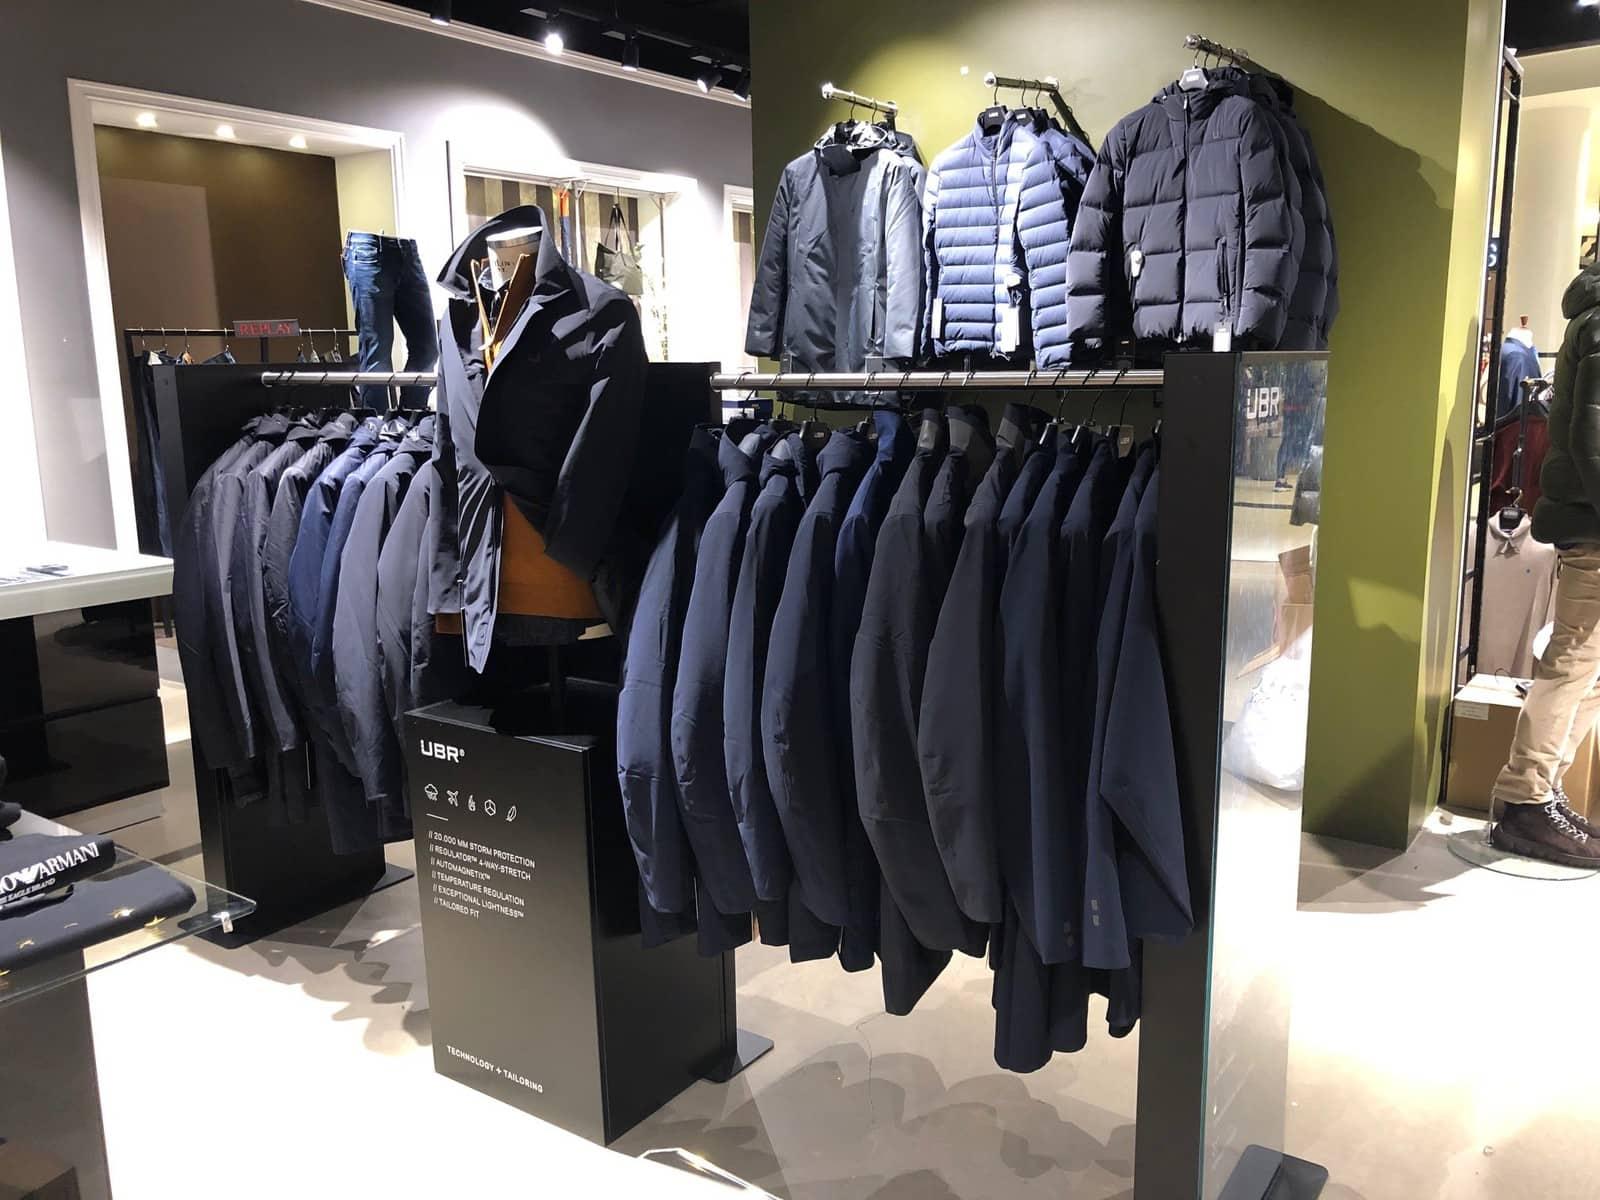 UBR® – shop system for premium functional jackets